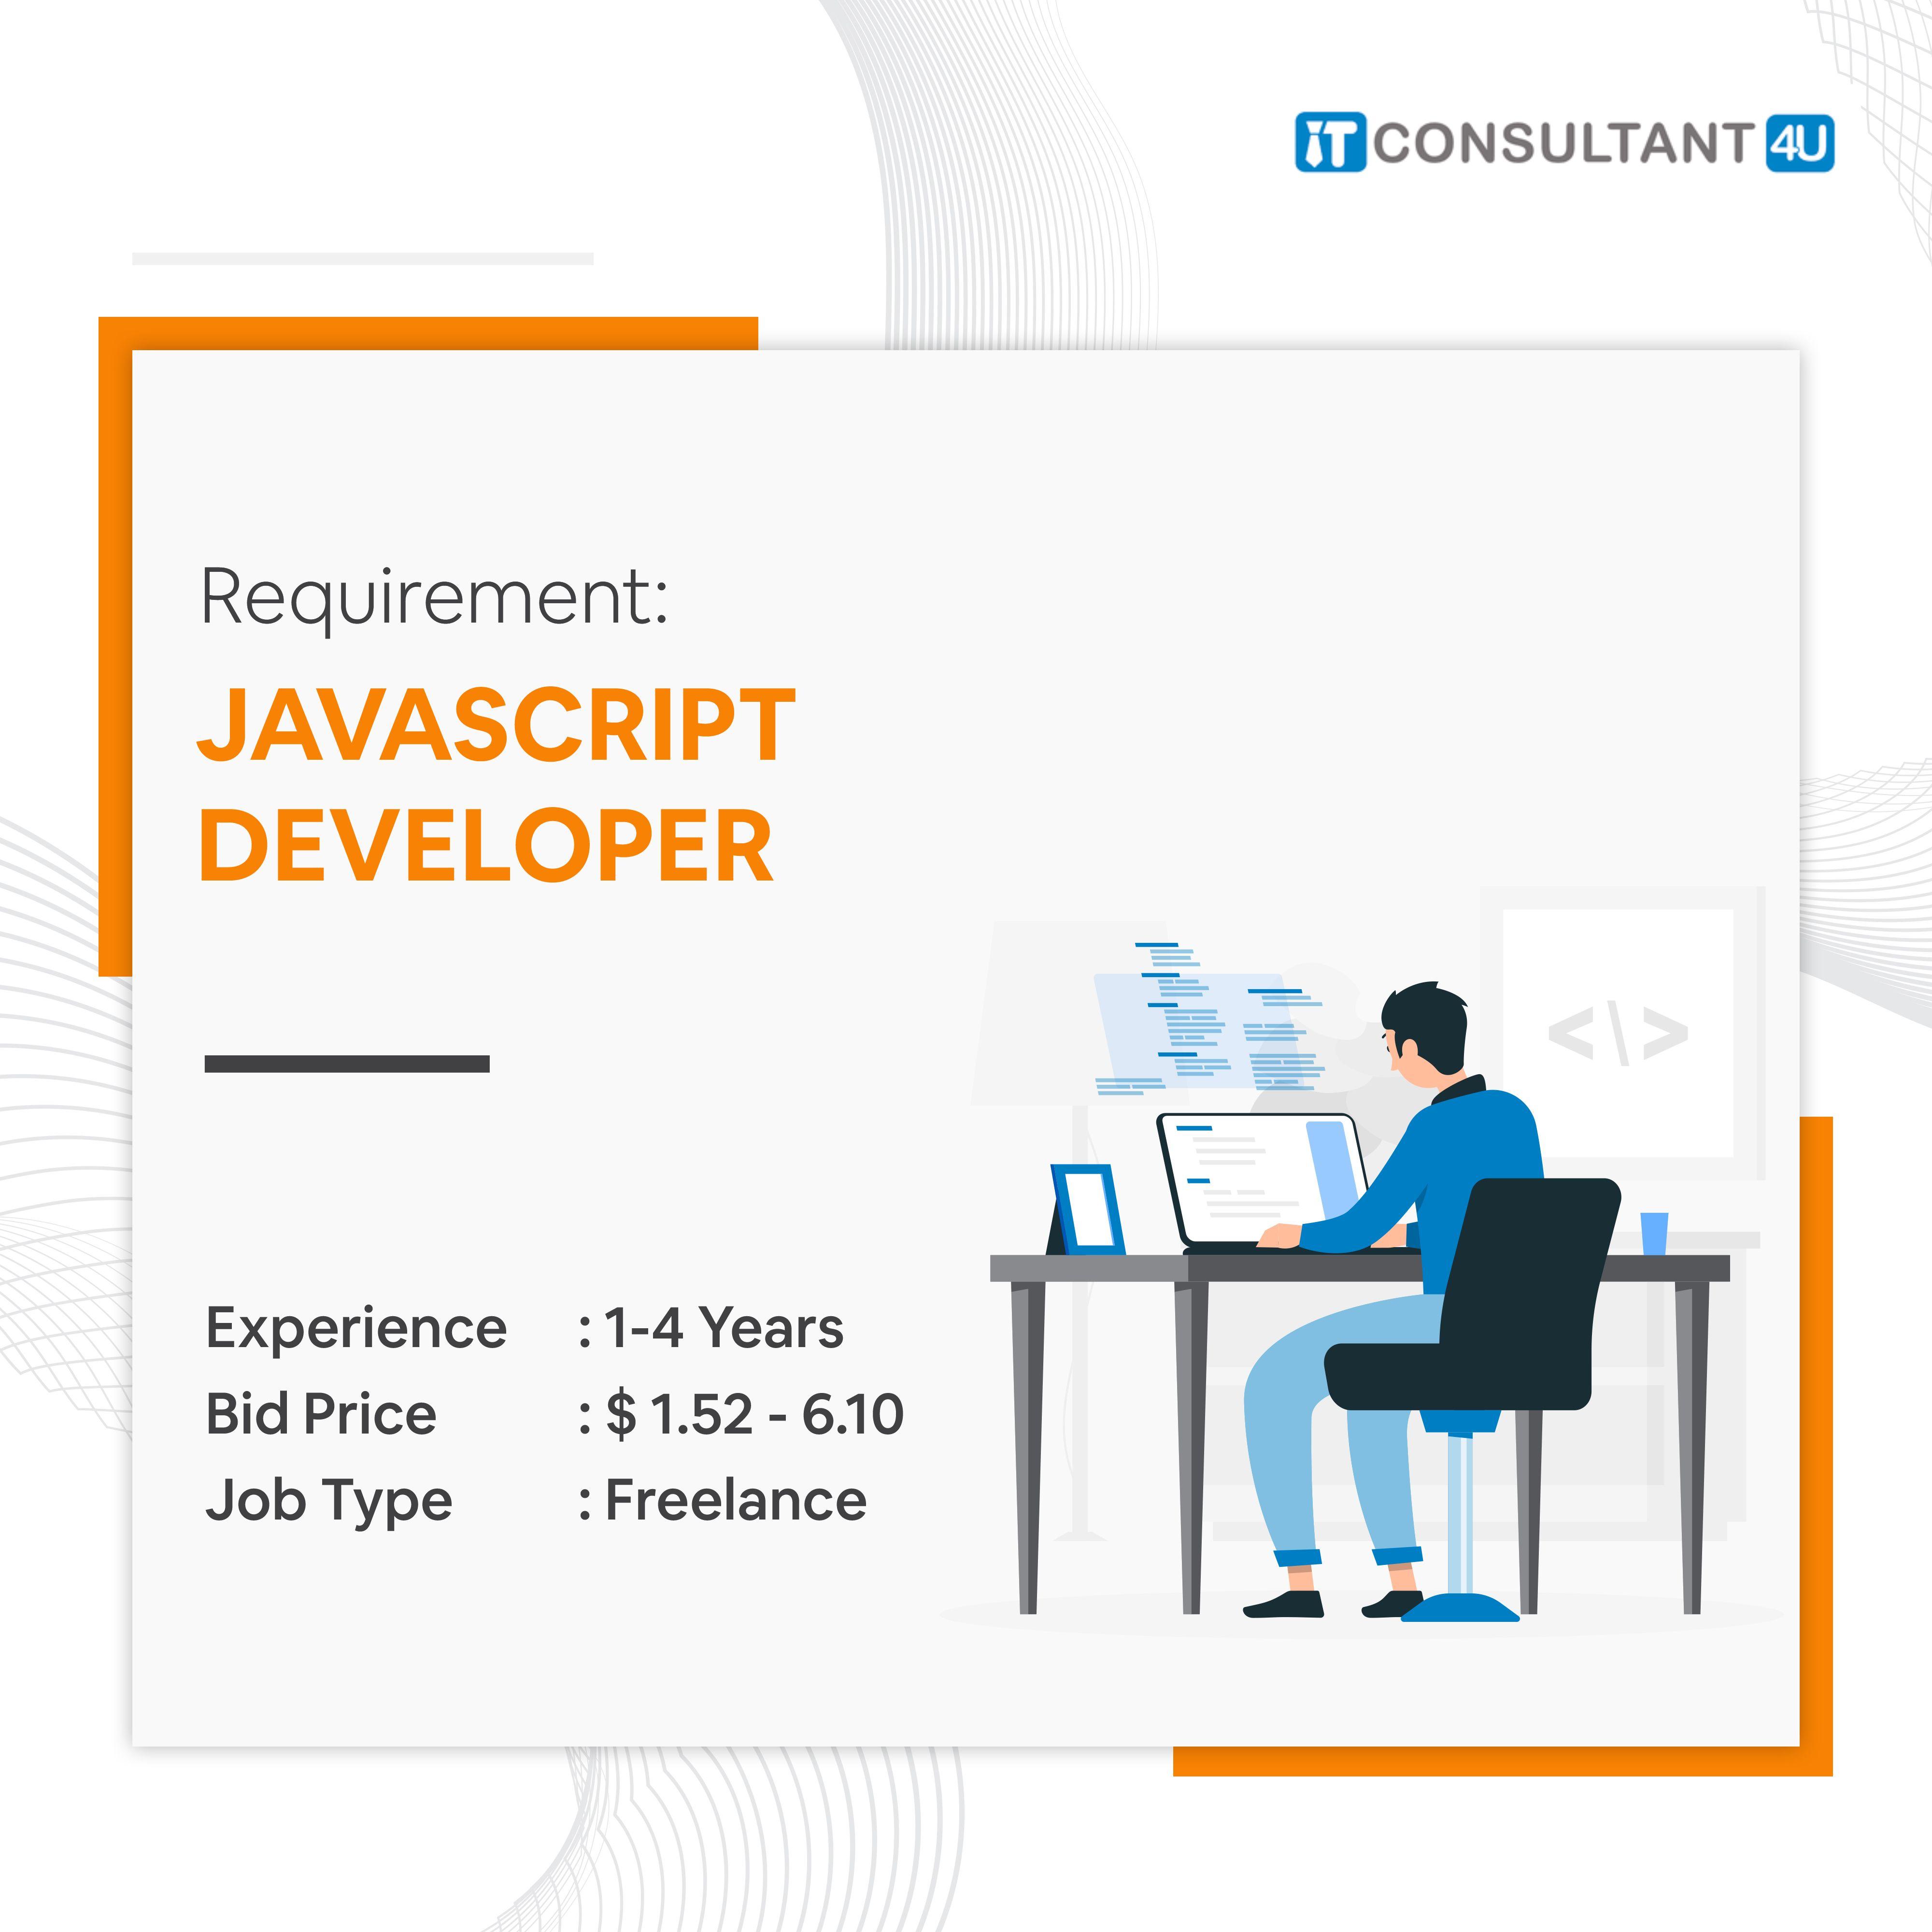 Javascriptdeveloper Itconsultant4u Workfromhome Remotework Freelancing Jobs Remote Work Job